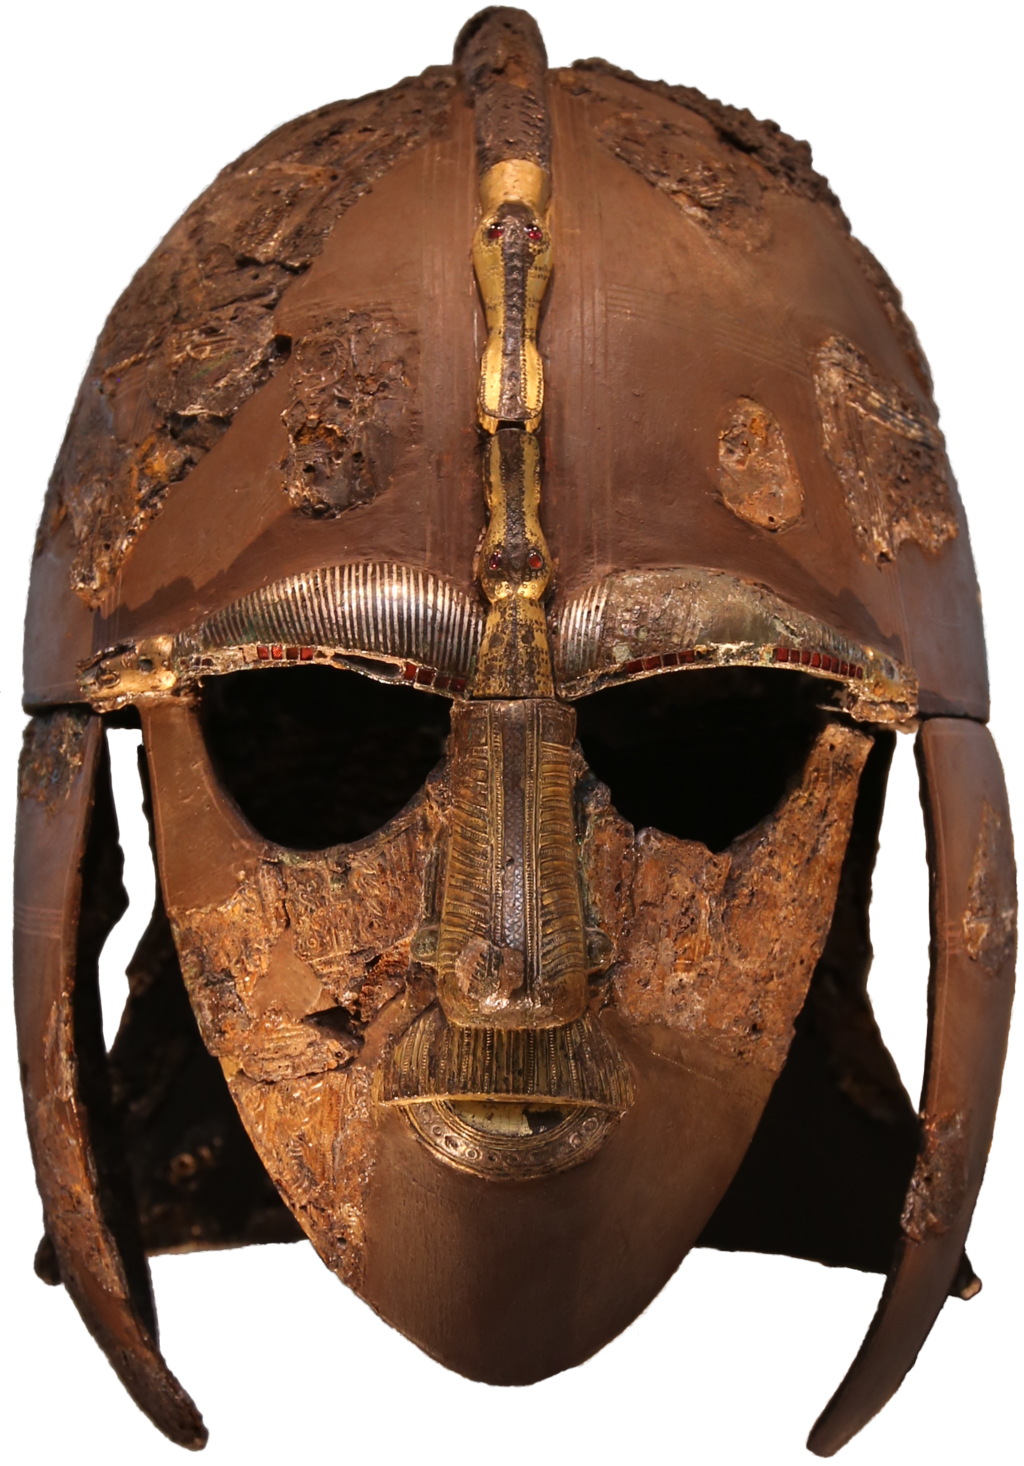 Sutton Hoo helmet 2016